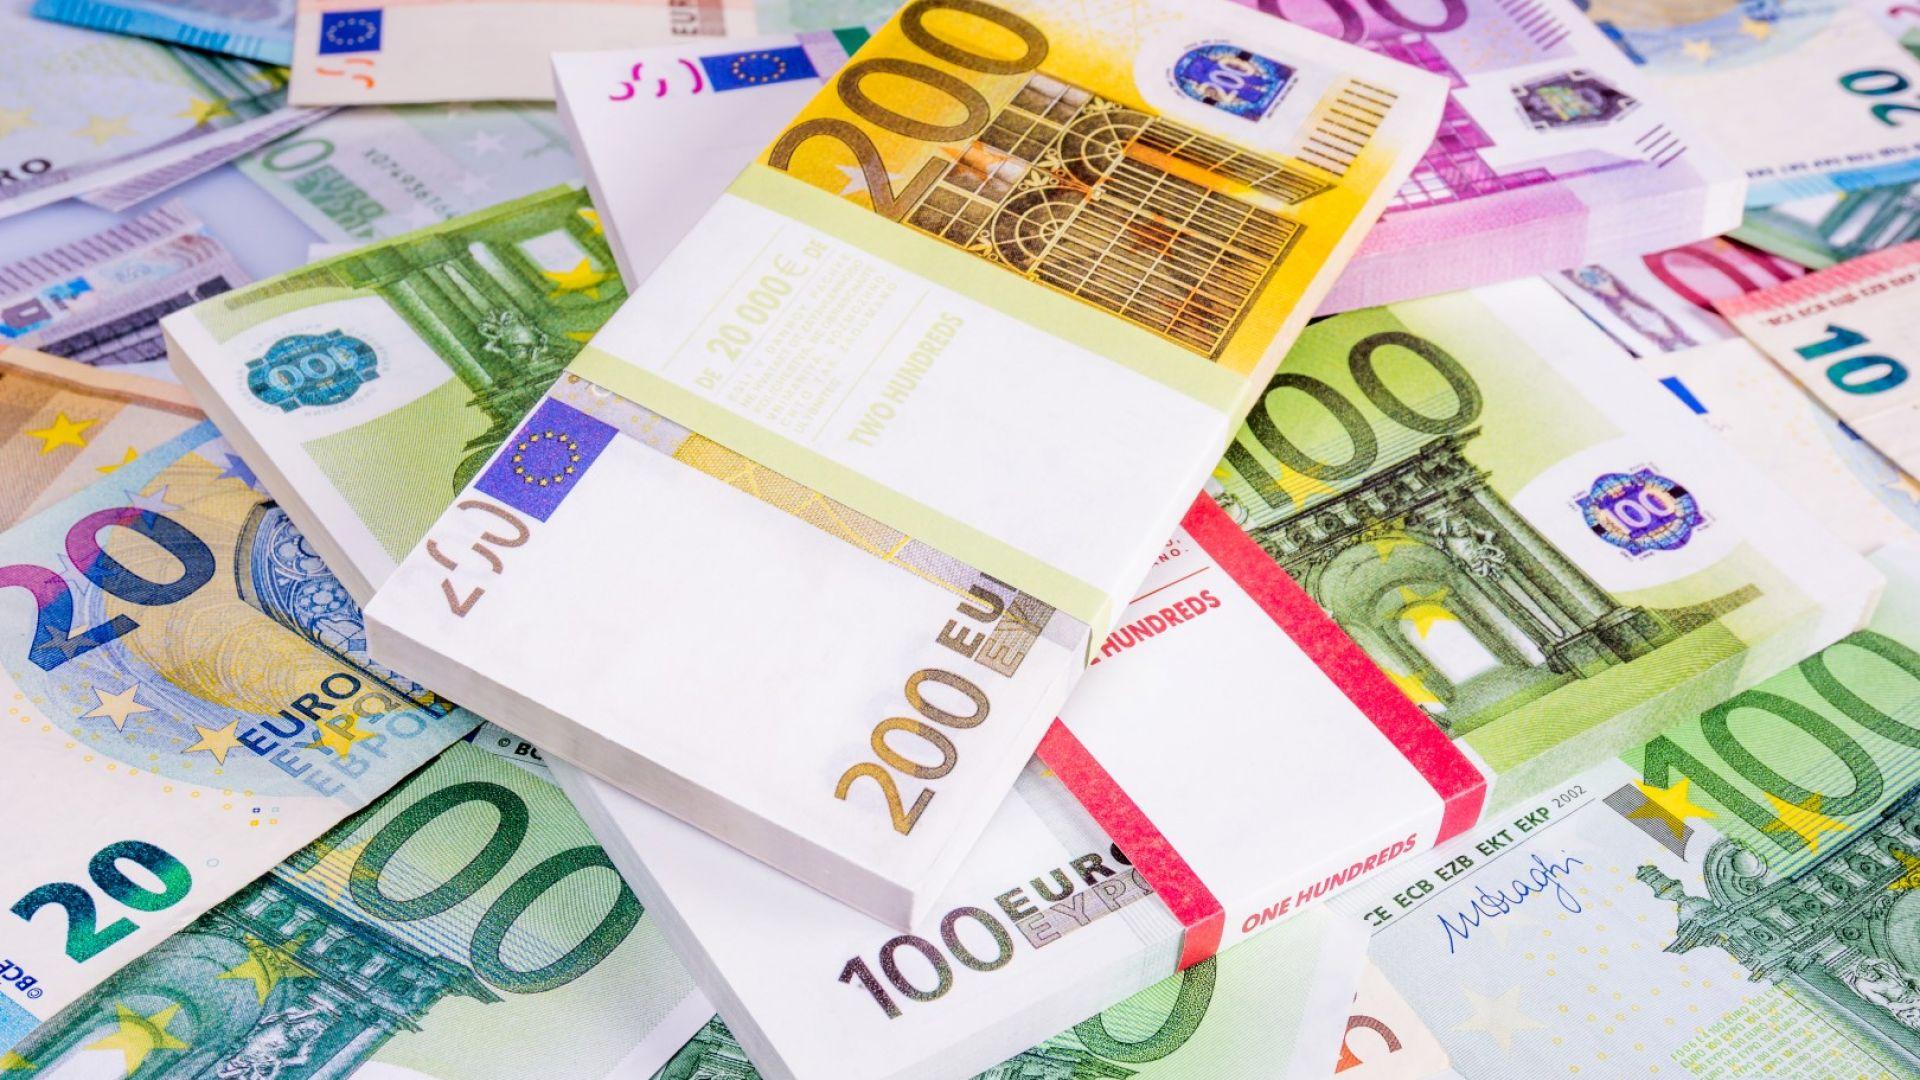 Гръцки фонд плати 78,6 млн. евро за сграда в София